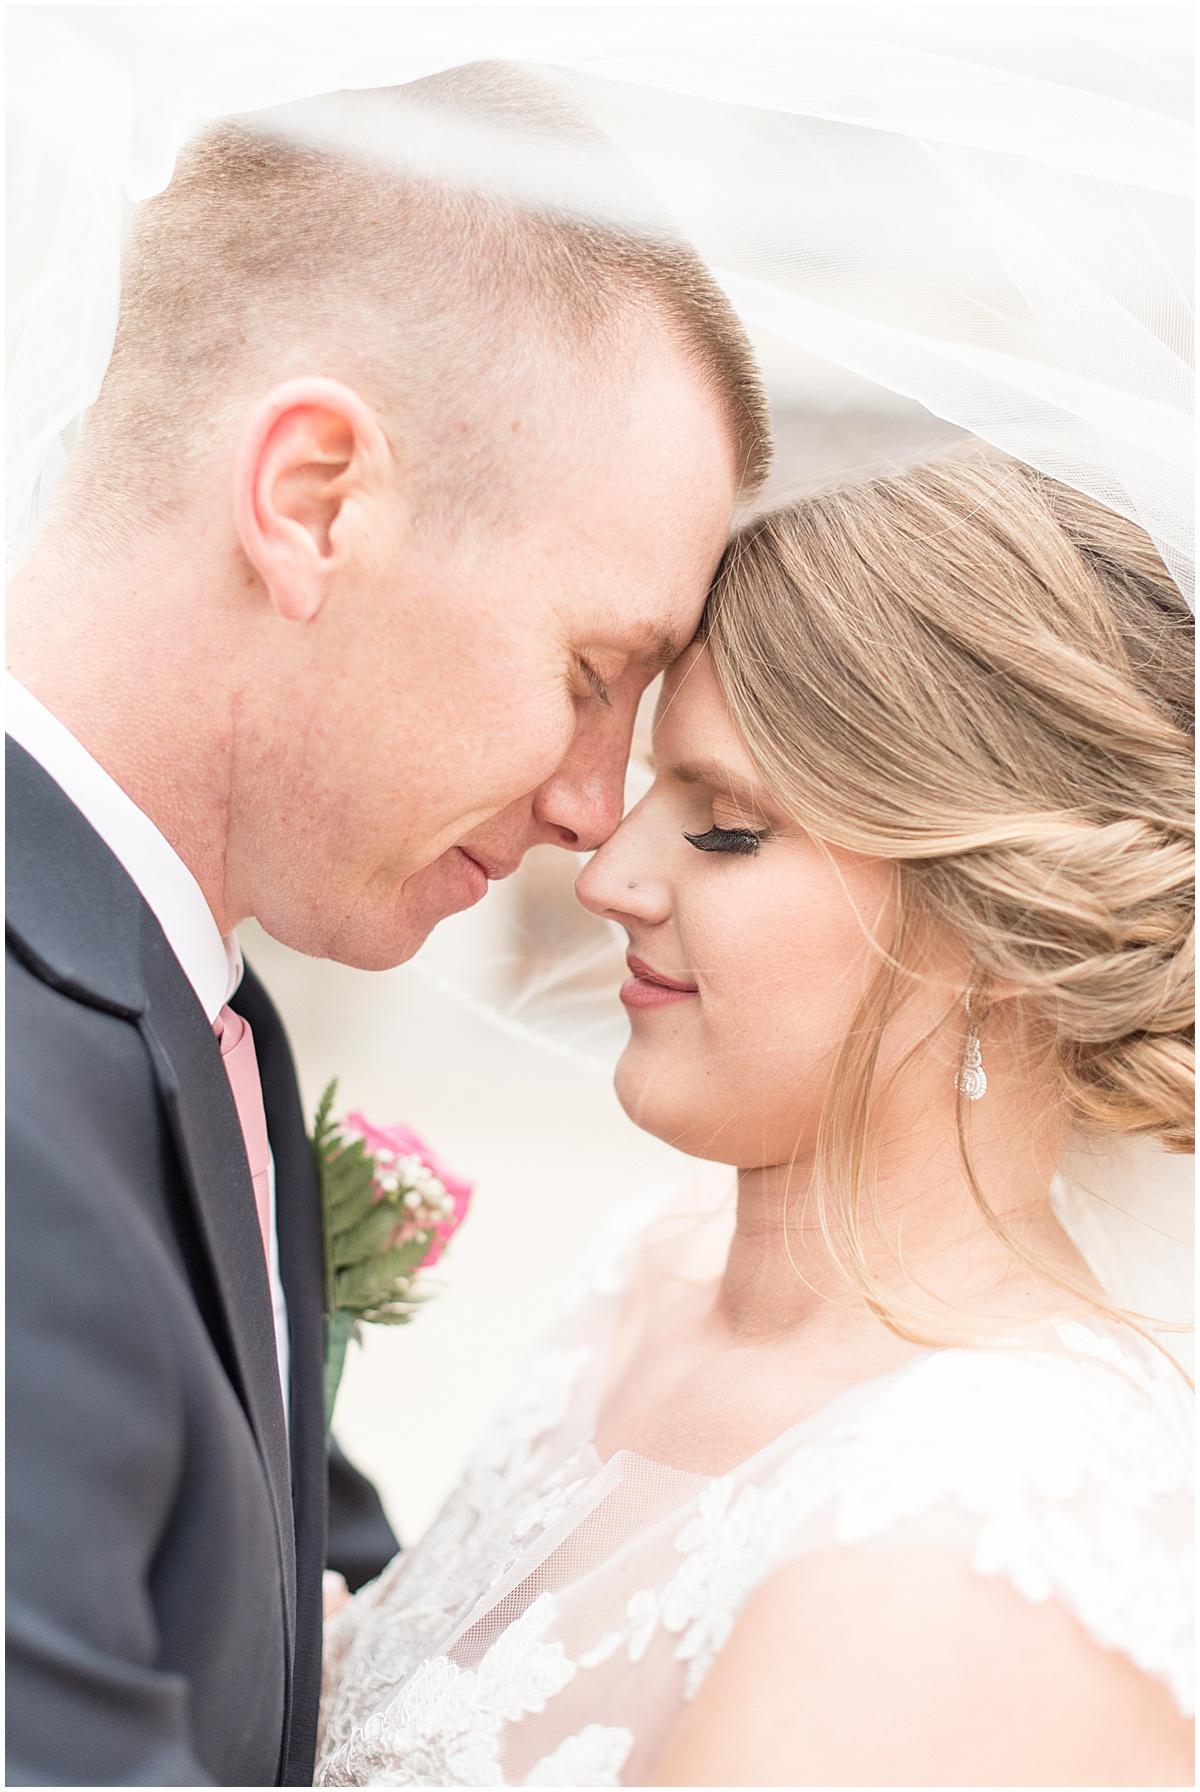 Anderson Wedding - Wedding in Berwyn Illinois 89.jpg